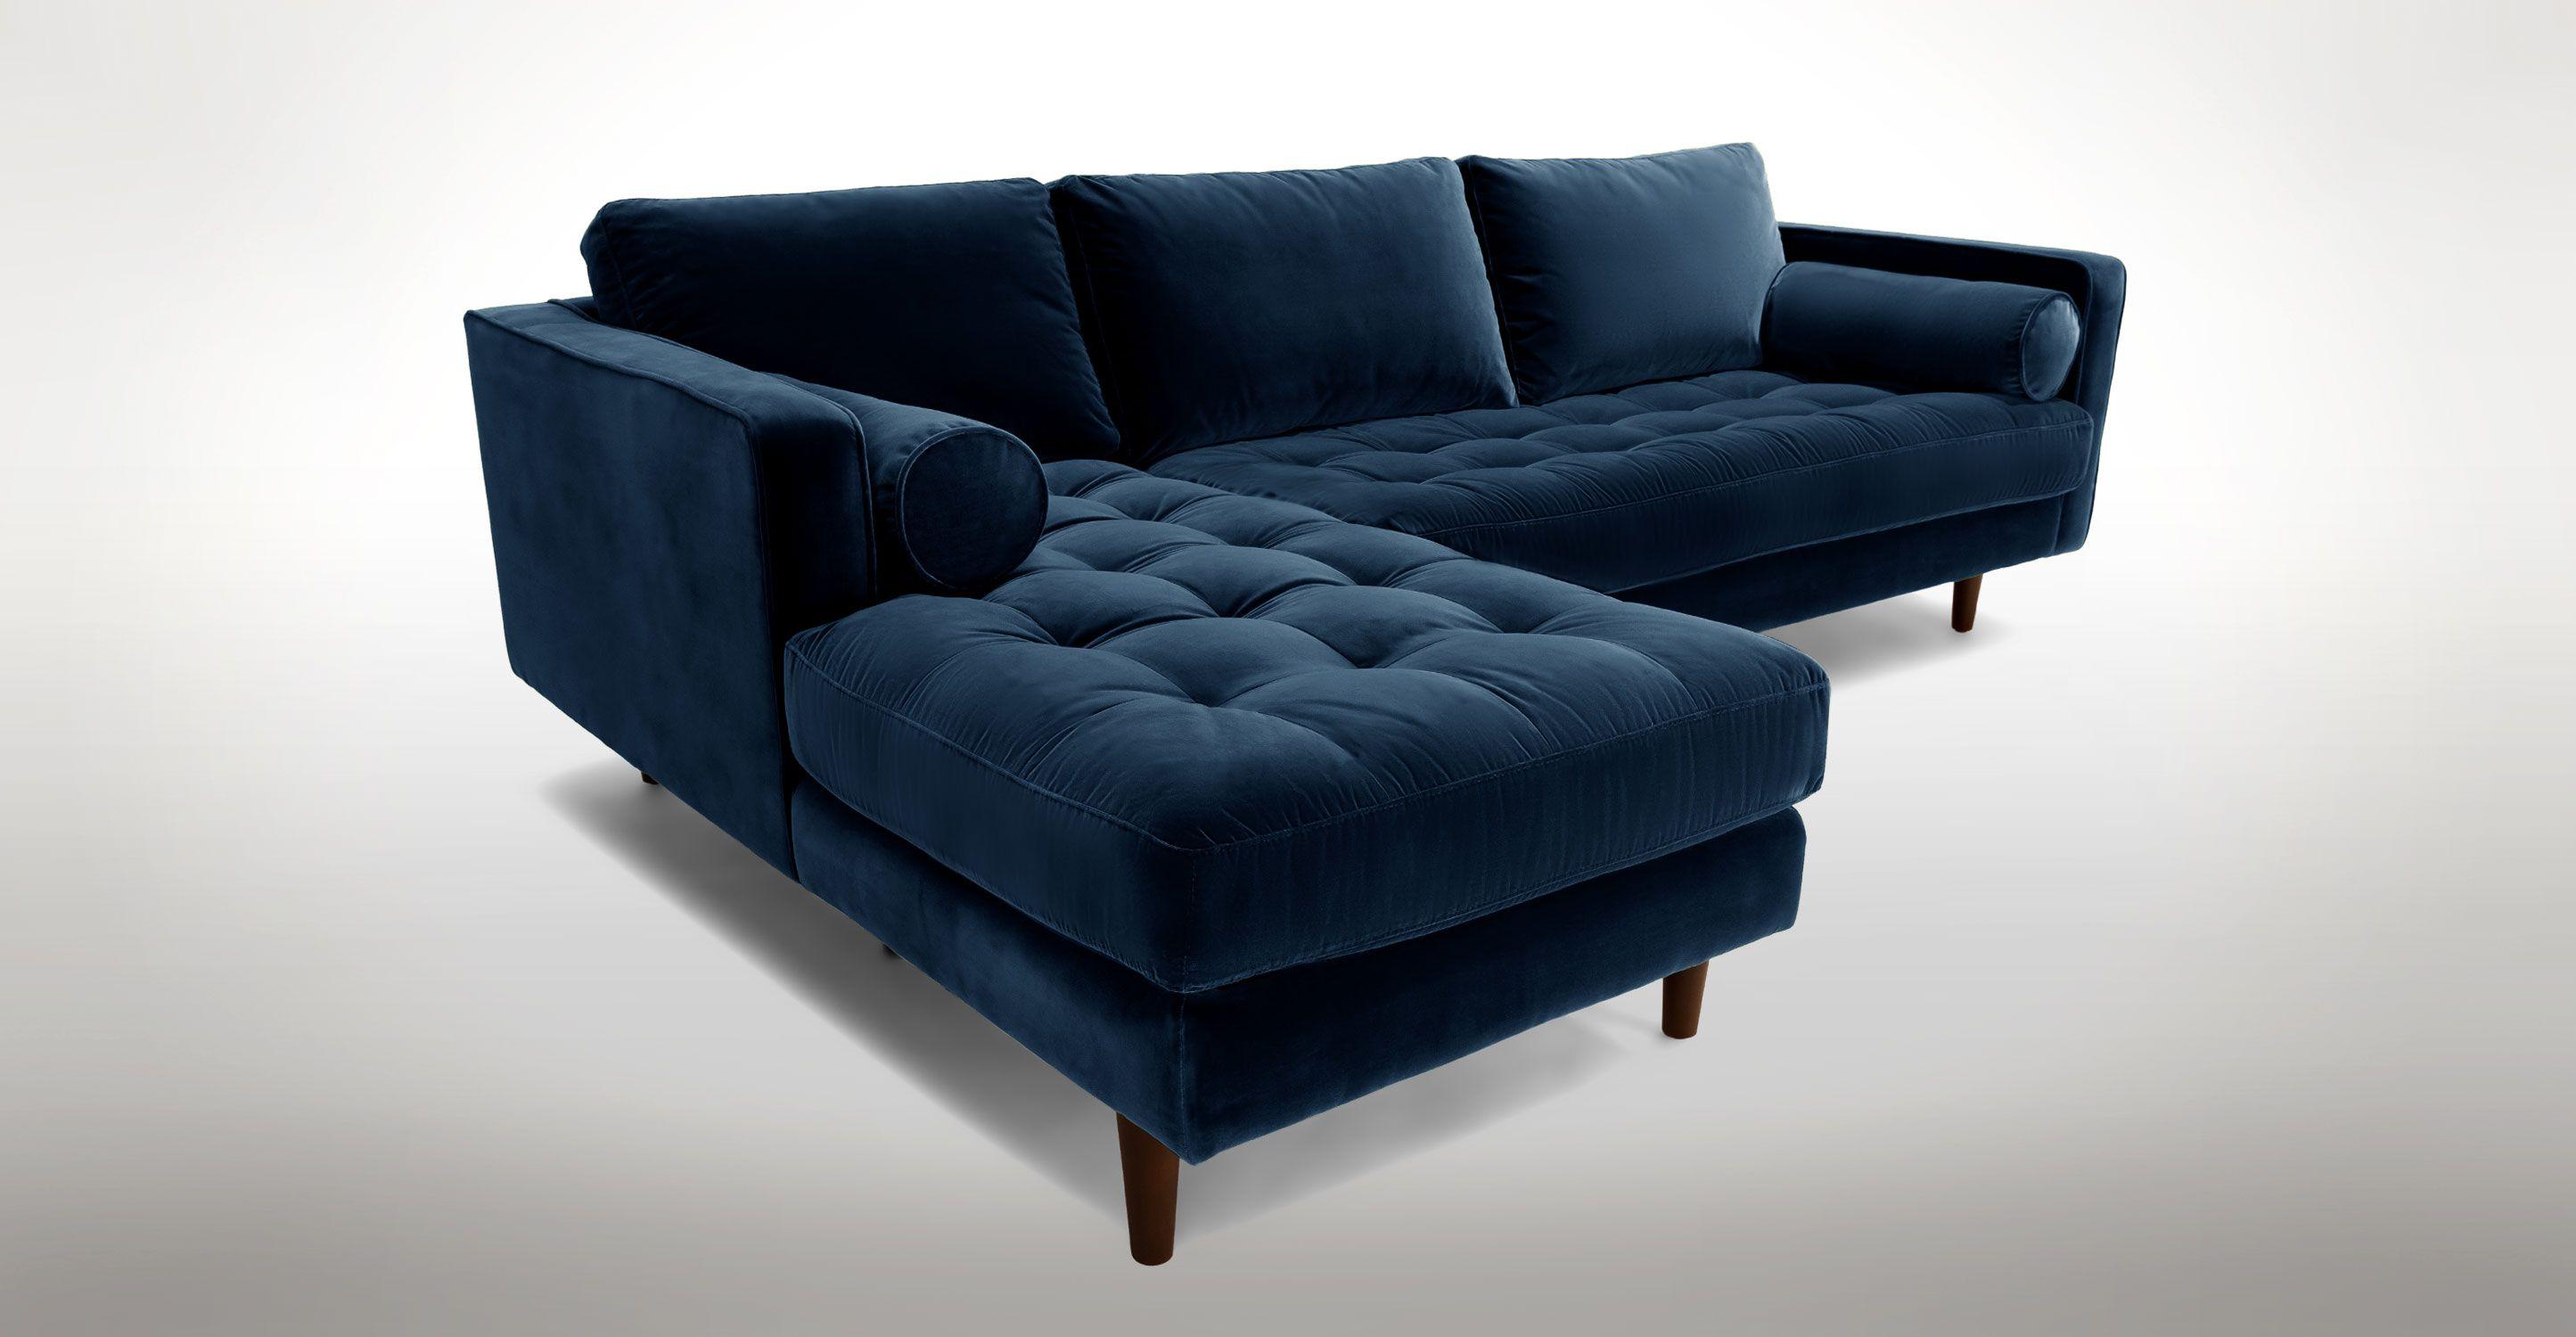 sofasandmore clearance sofa furniture dark blue velvet left sectional tufted article sven